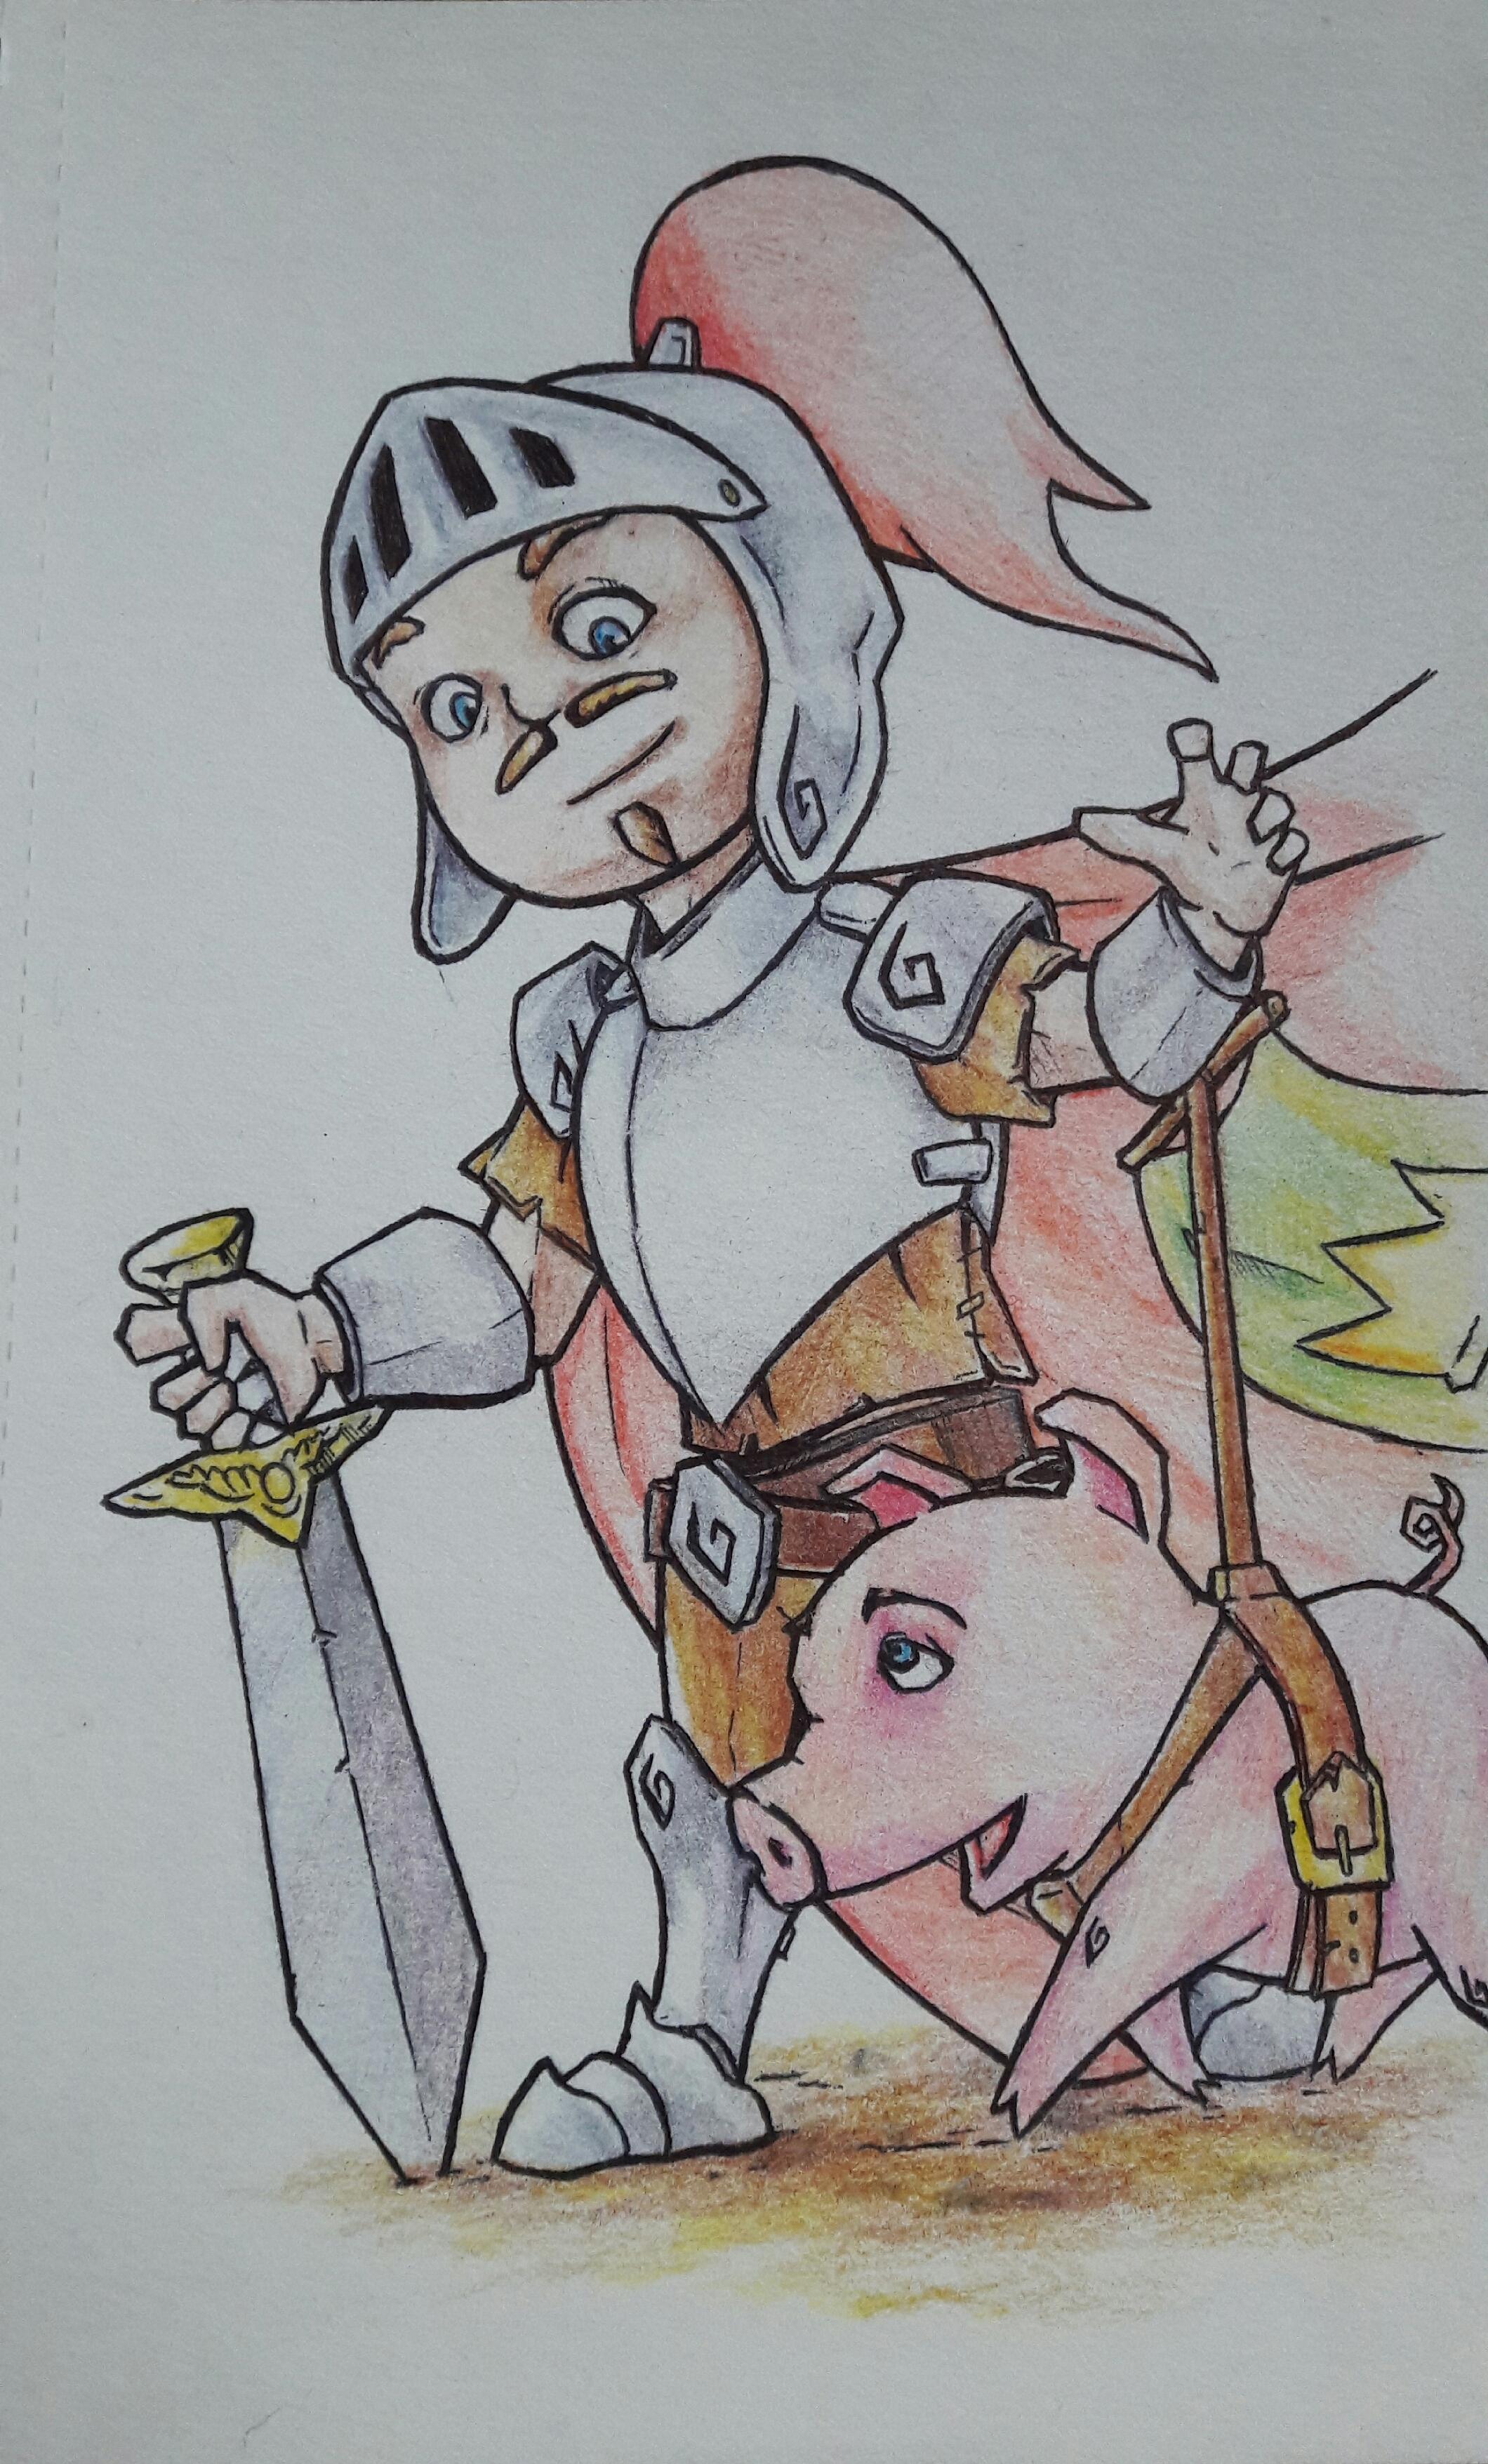 A knight's pet